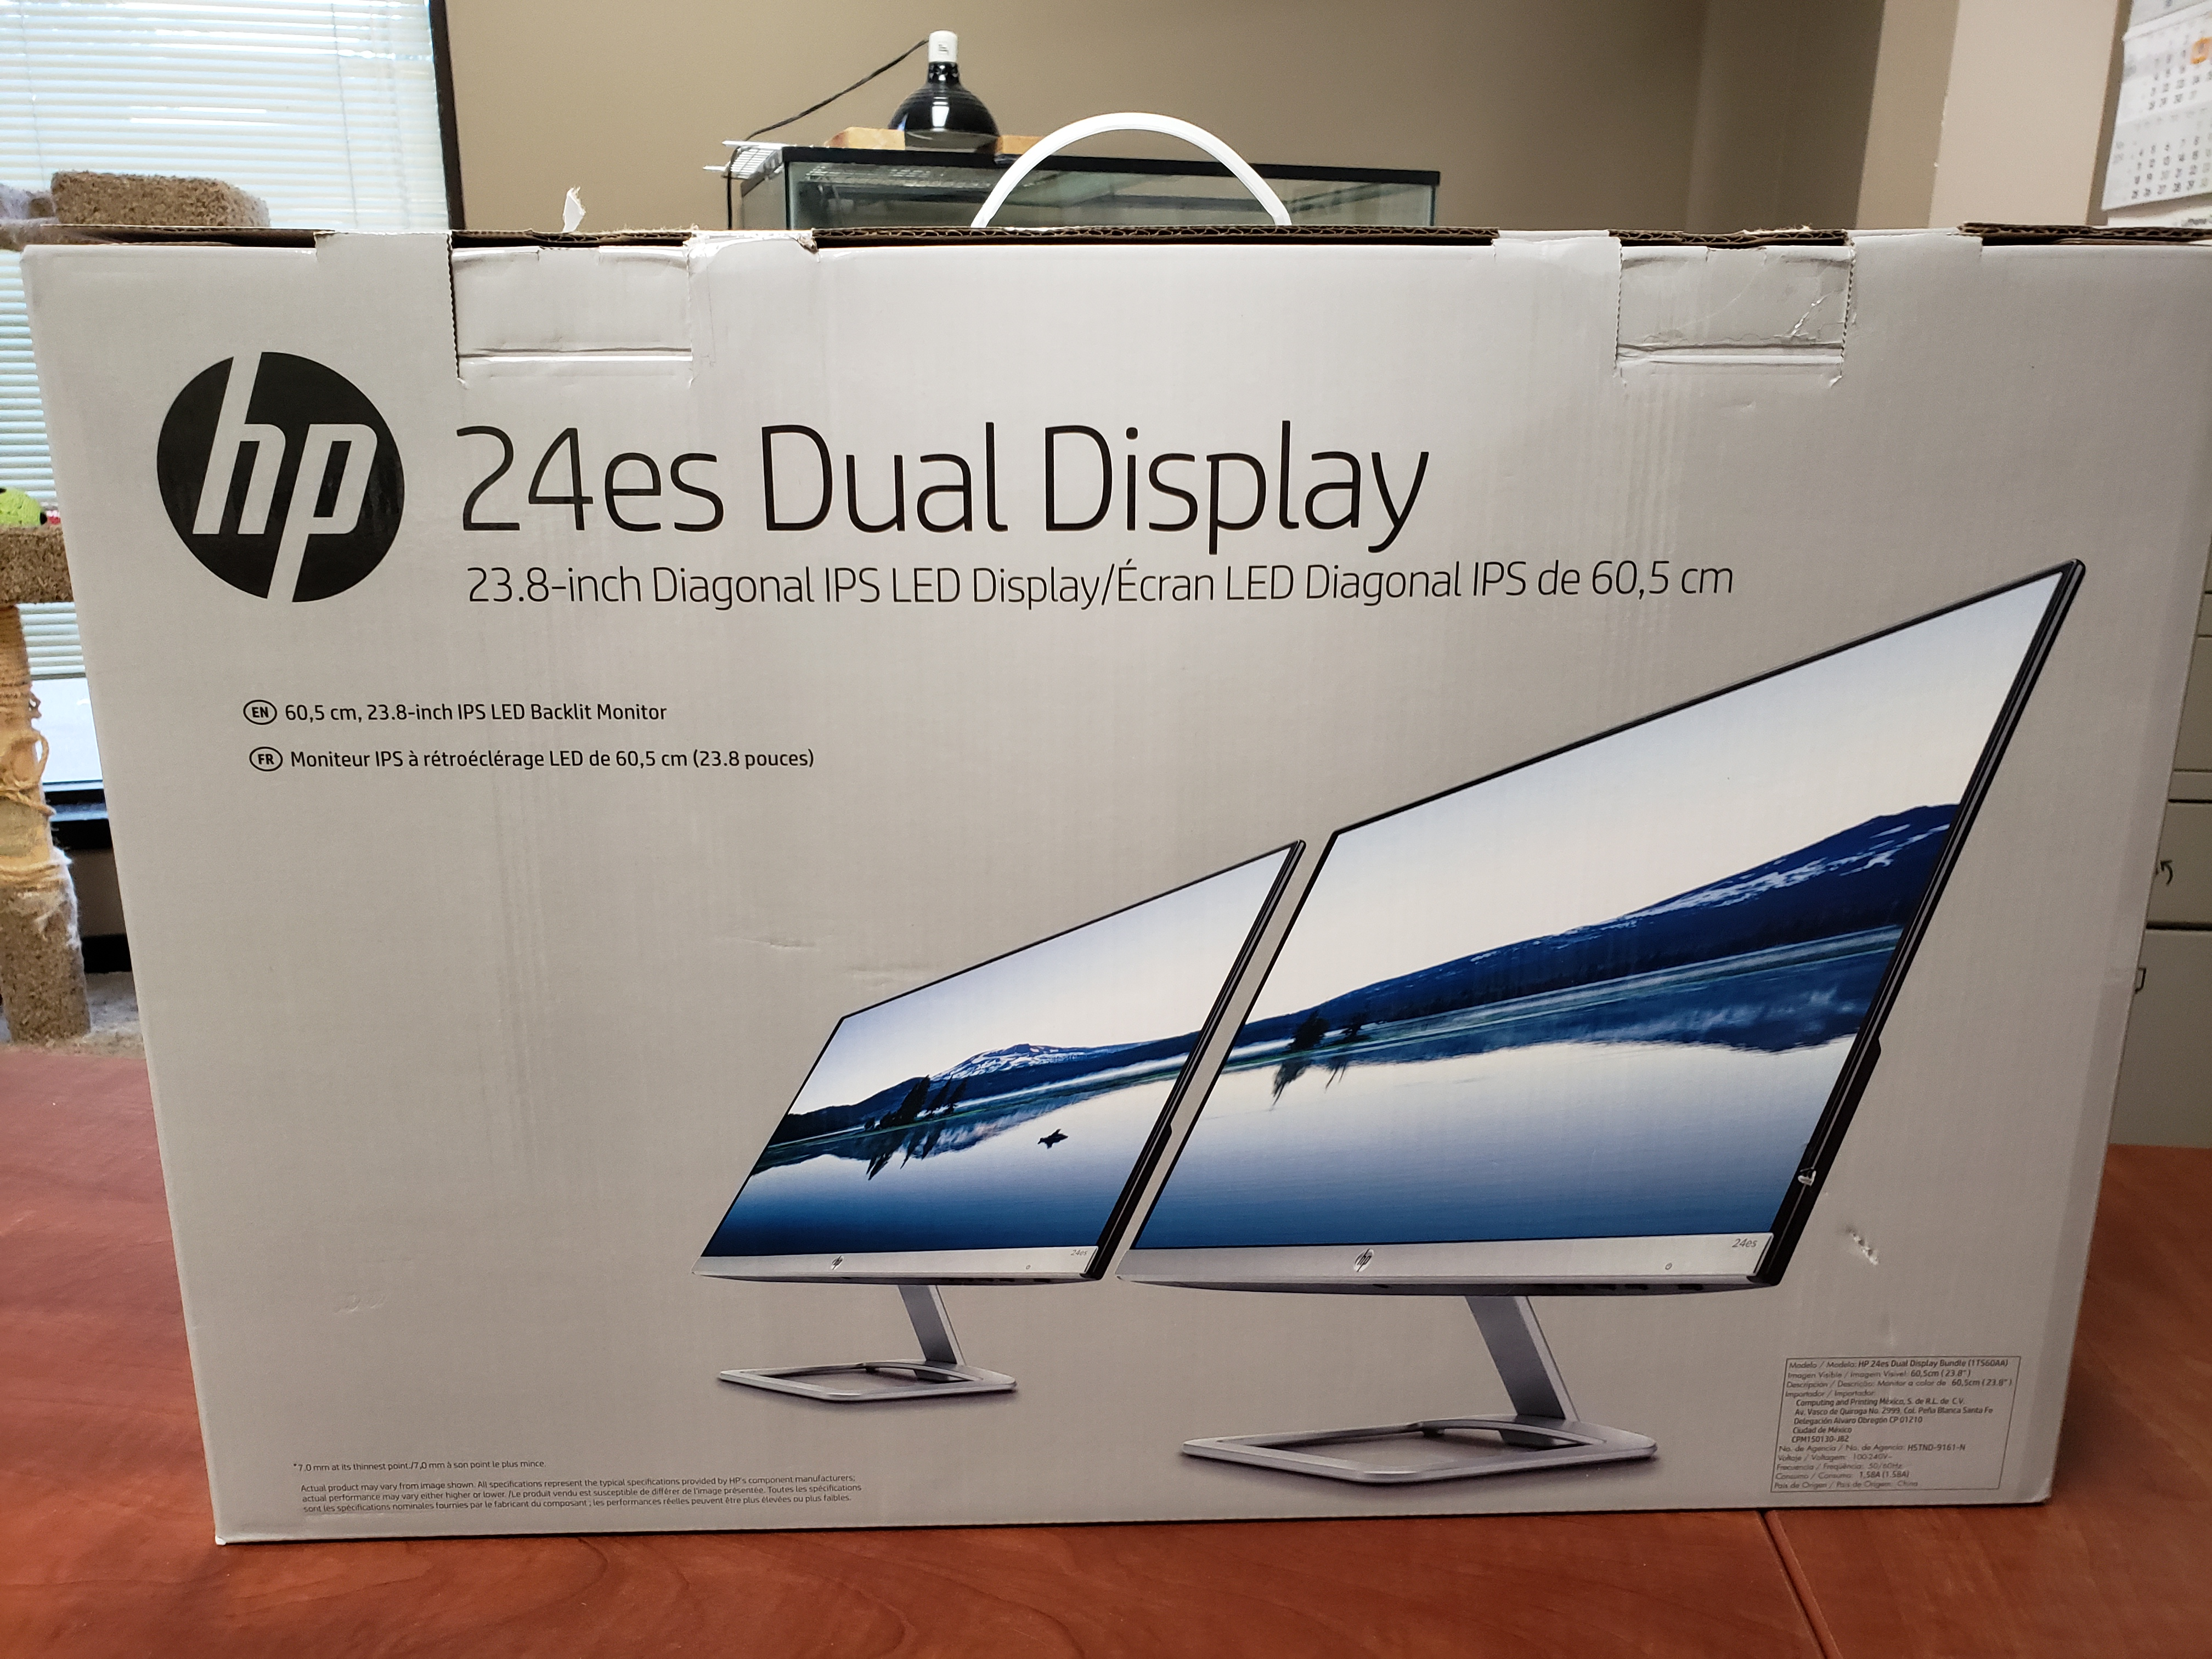 "new 24"" dual LCD monitors"